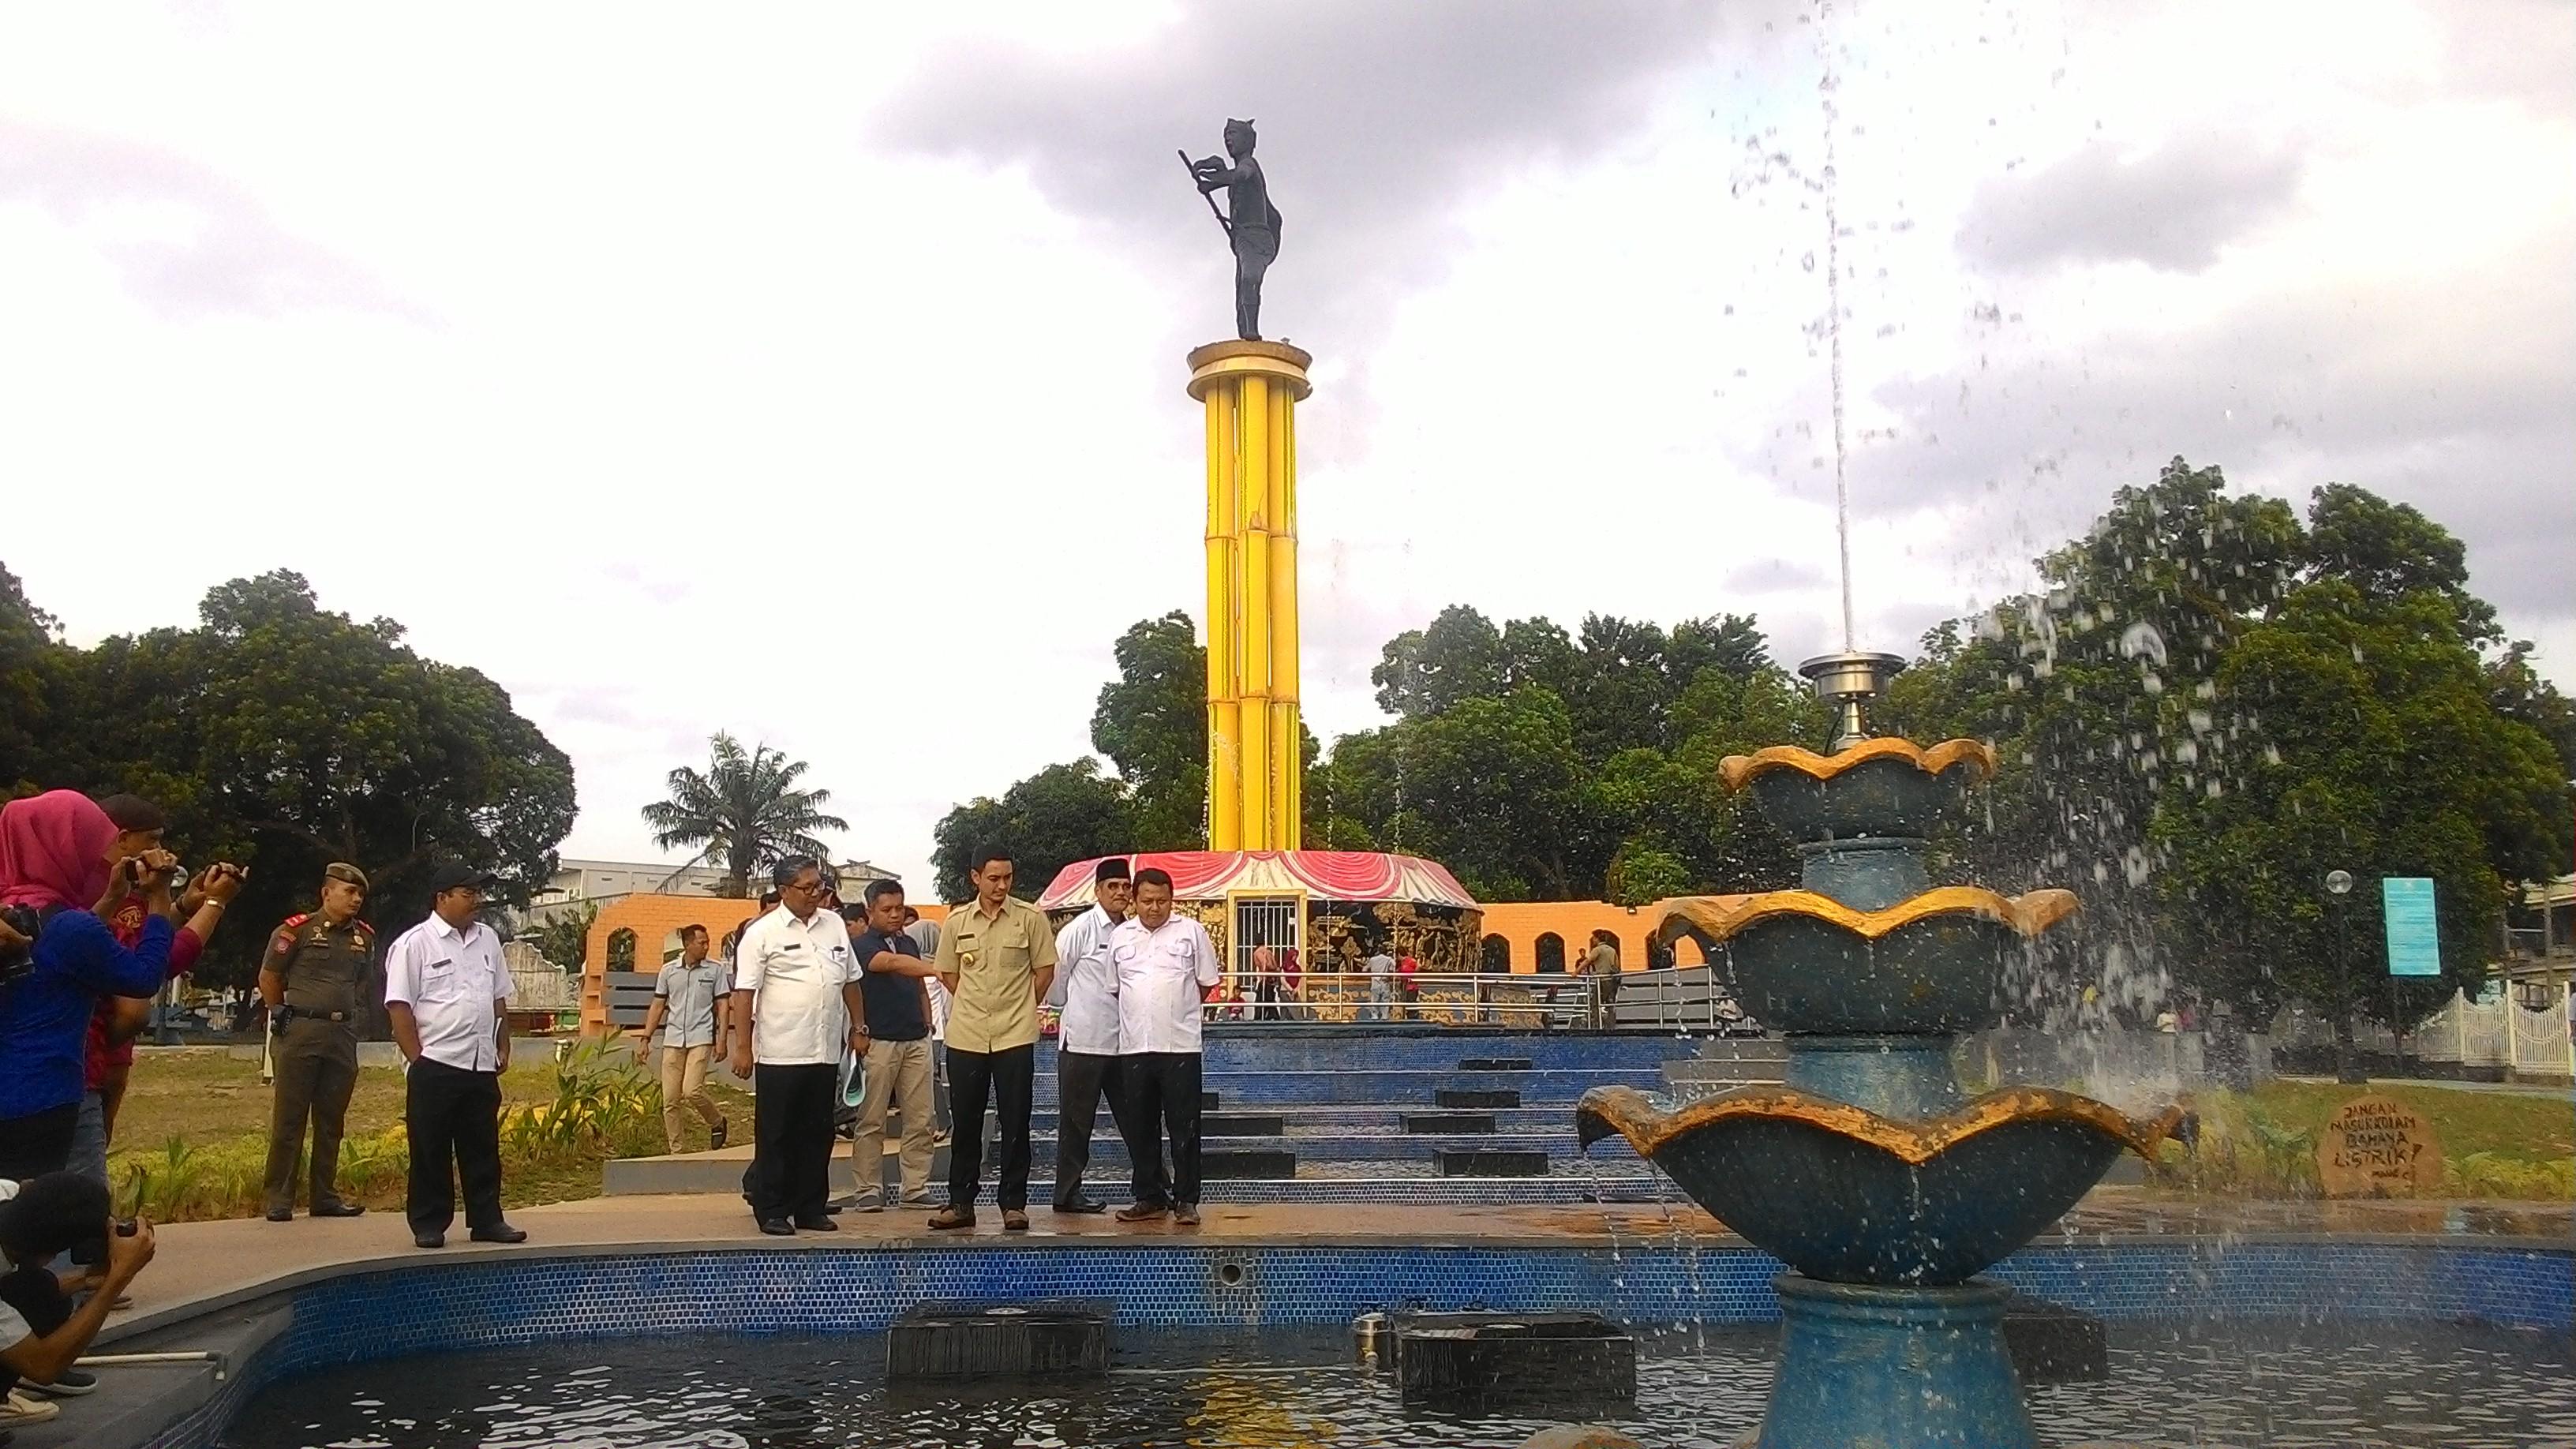 Tinjau Pembangunan Tugu Juang Taman Nyaman Kabar Daerah Jambi Sipin